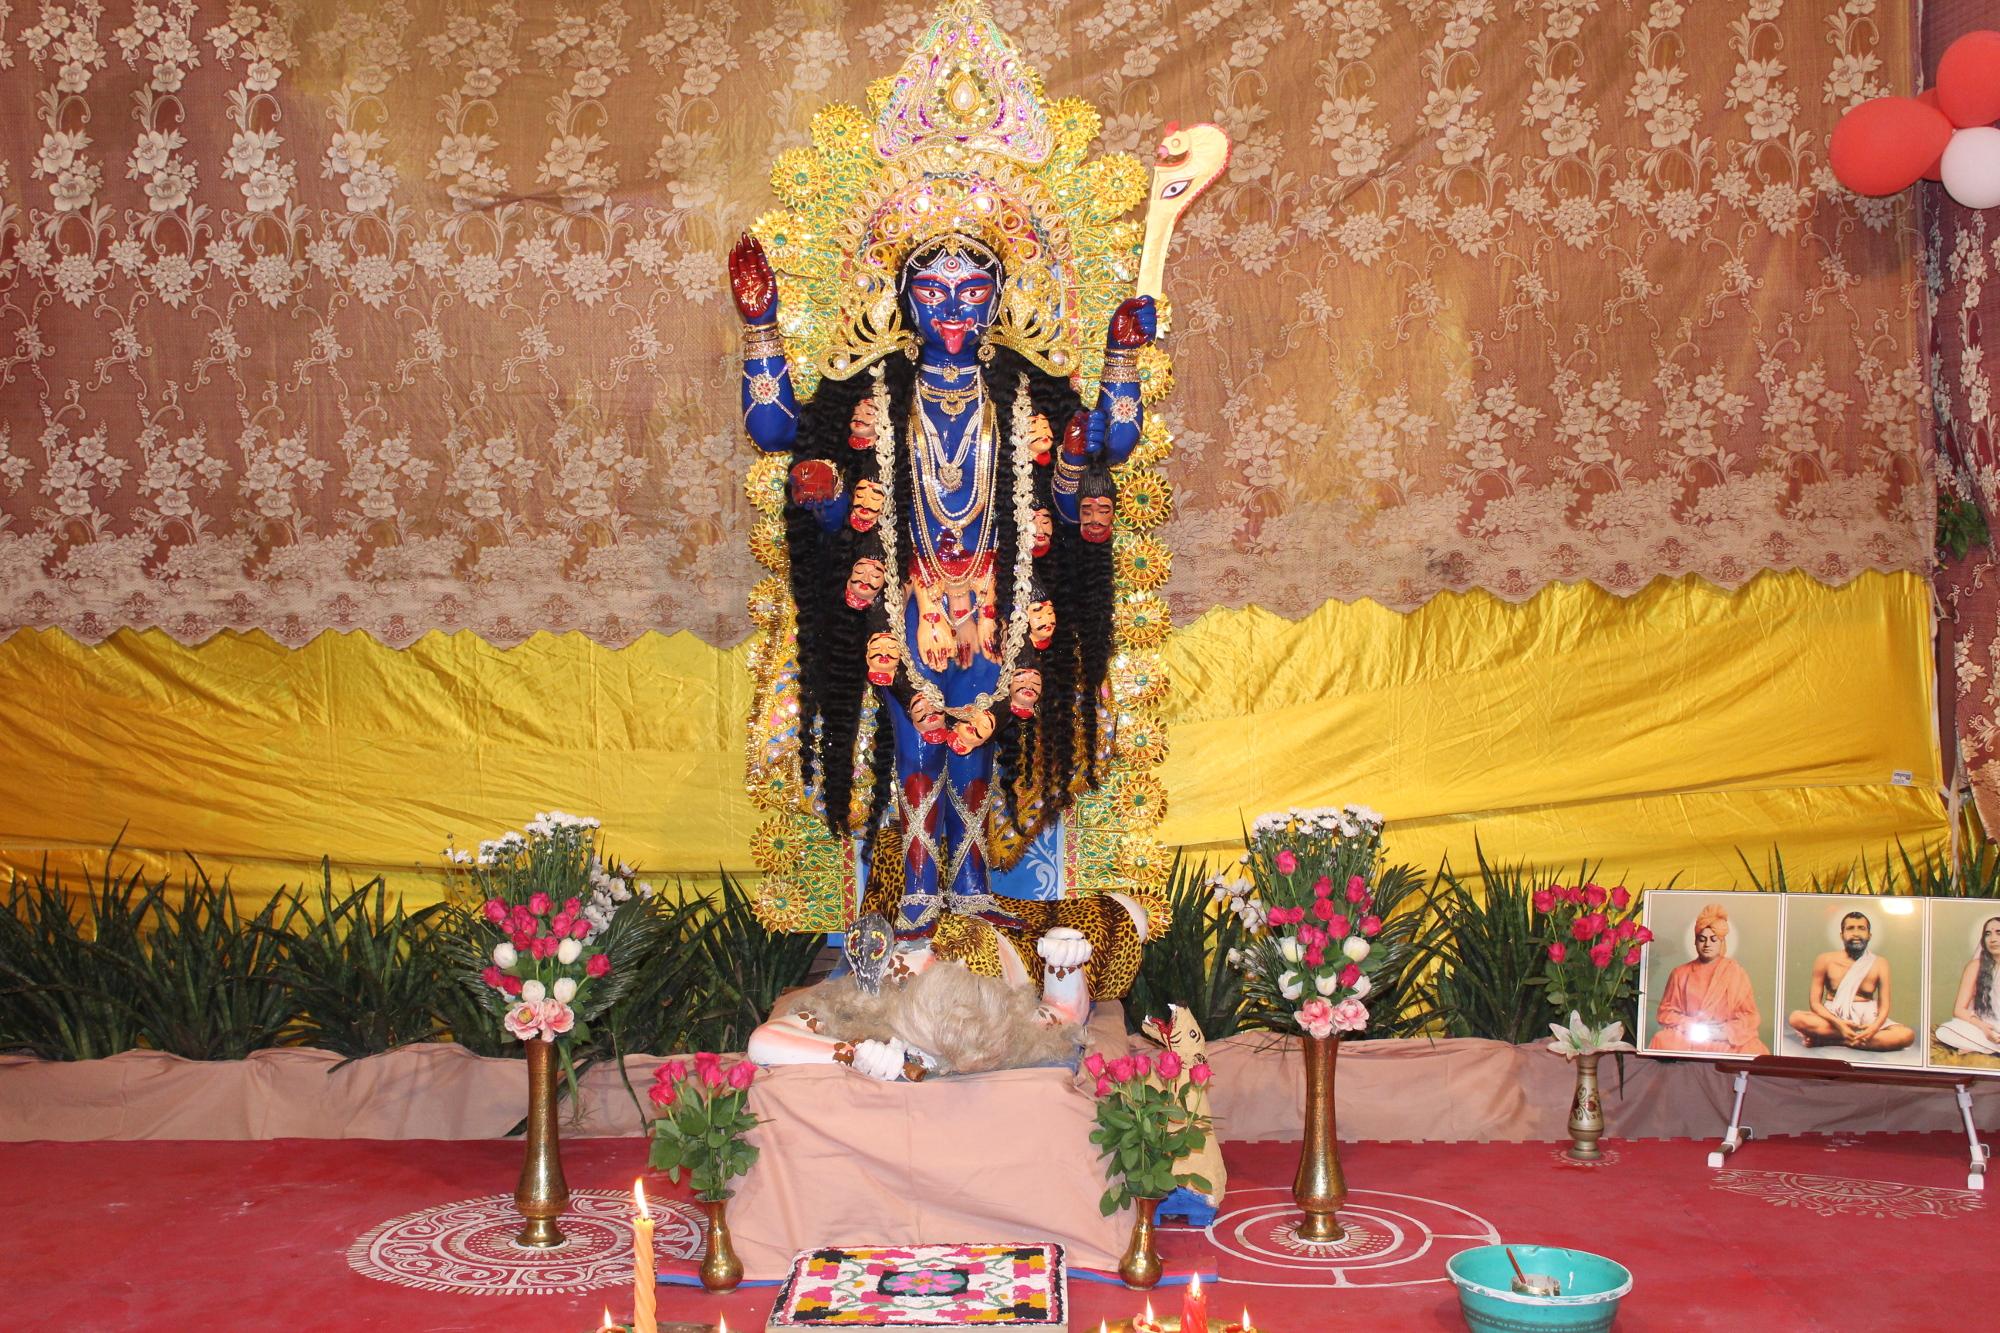 Mother Kali at Sri Sri Kali Puja at Ramakrishna Mission Ashrama, Kanpur